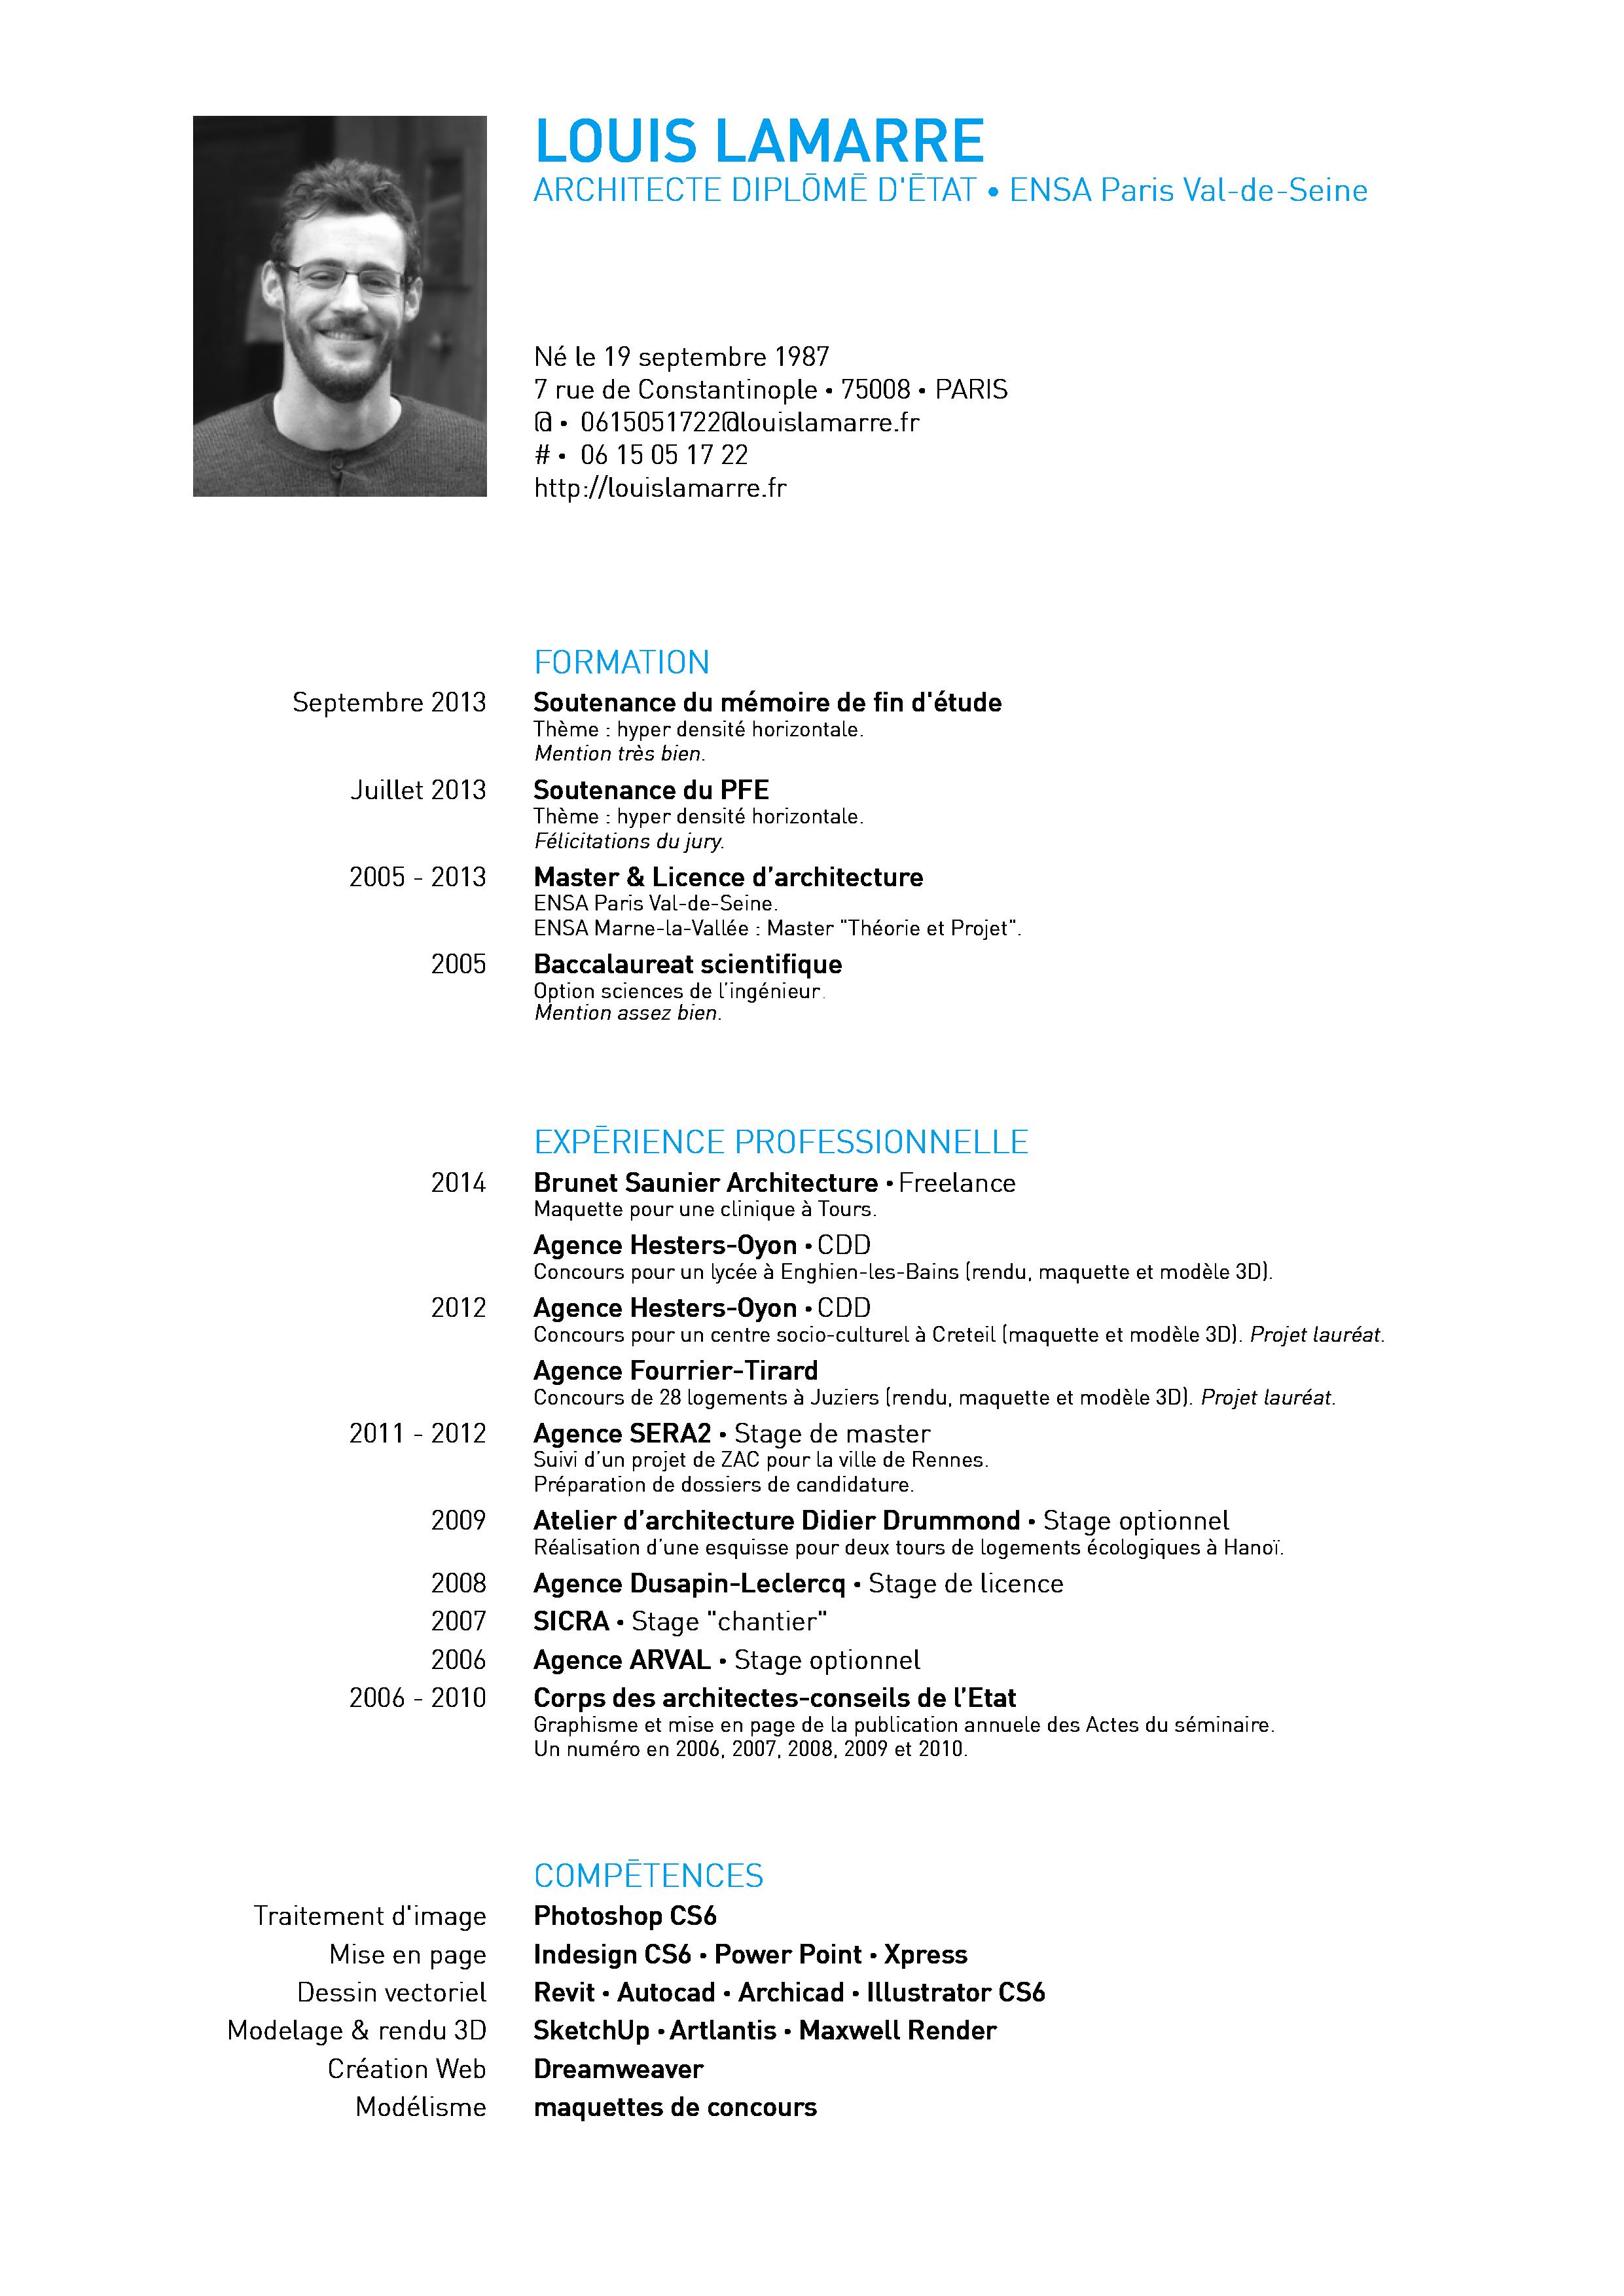 Louis Lamarre Modele Cv Theorie Conseil